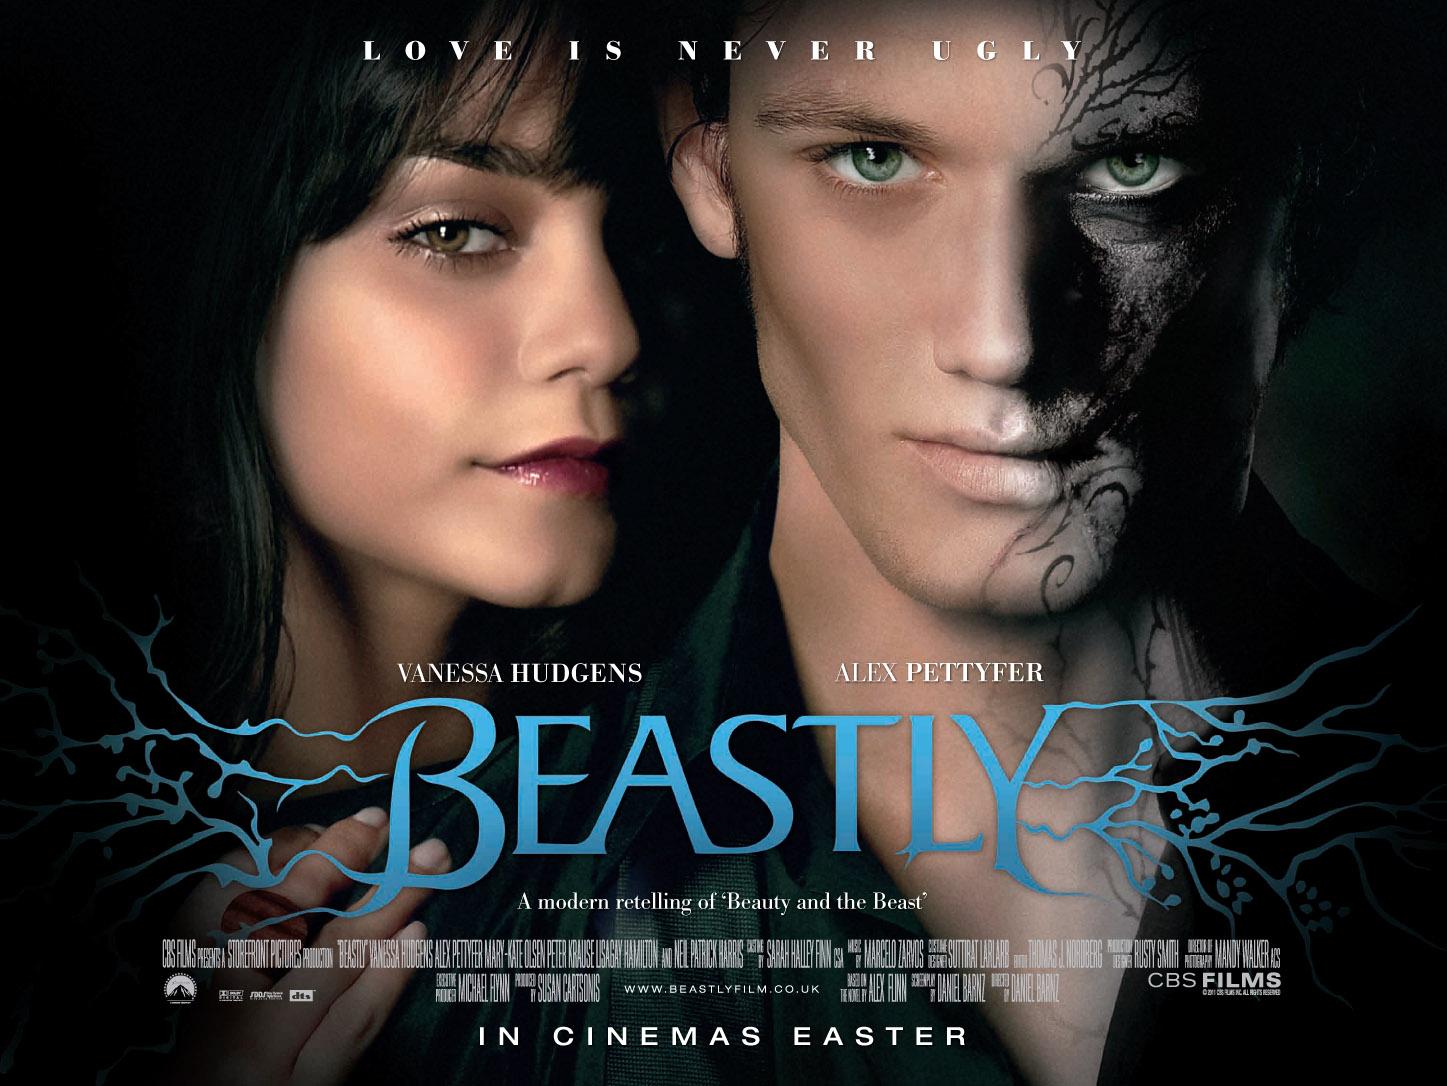 http://4.bp.blogspot.com/-FzNInNpEBQ0/T6qNgHJkT2I/AAAAAAAAJHk/-66KtdQoK_4/s1600/Vanessa-Hudgens-Beastly-Movie-Wallpaper.jpg